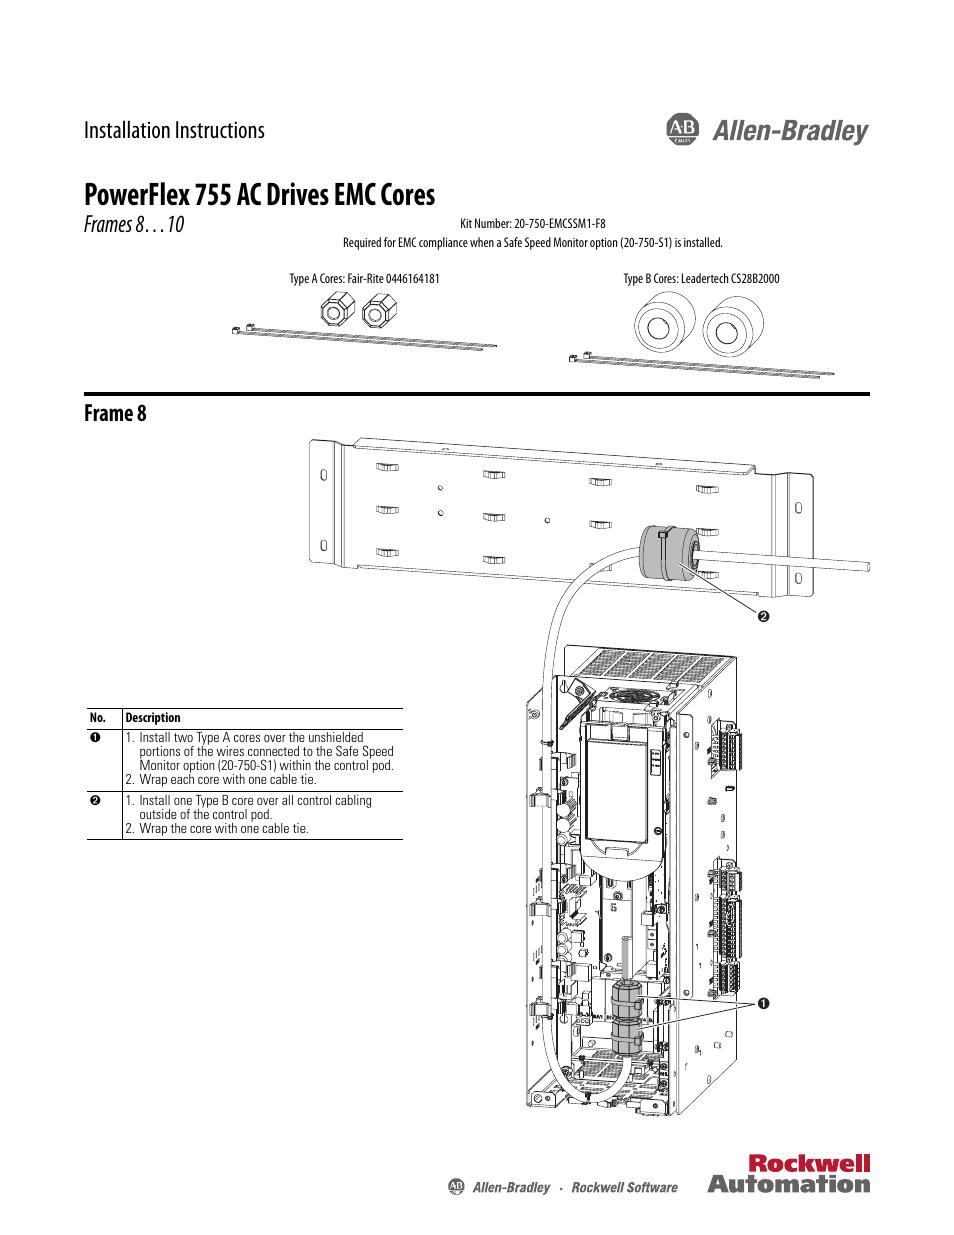 medium resolution of powerflex 700 wiring diagram powerflex 70 wiring diagram ab powerflex 755 wiring diagram electrolux vacuum wiring diagrams